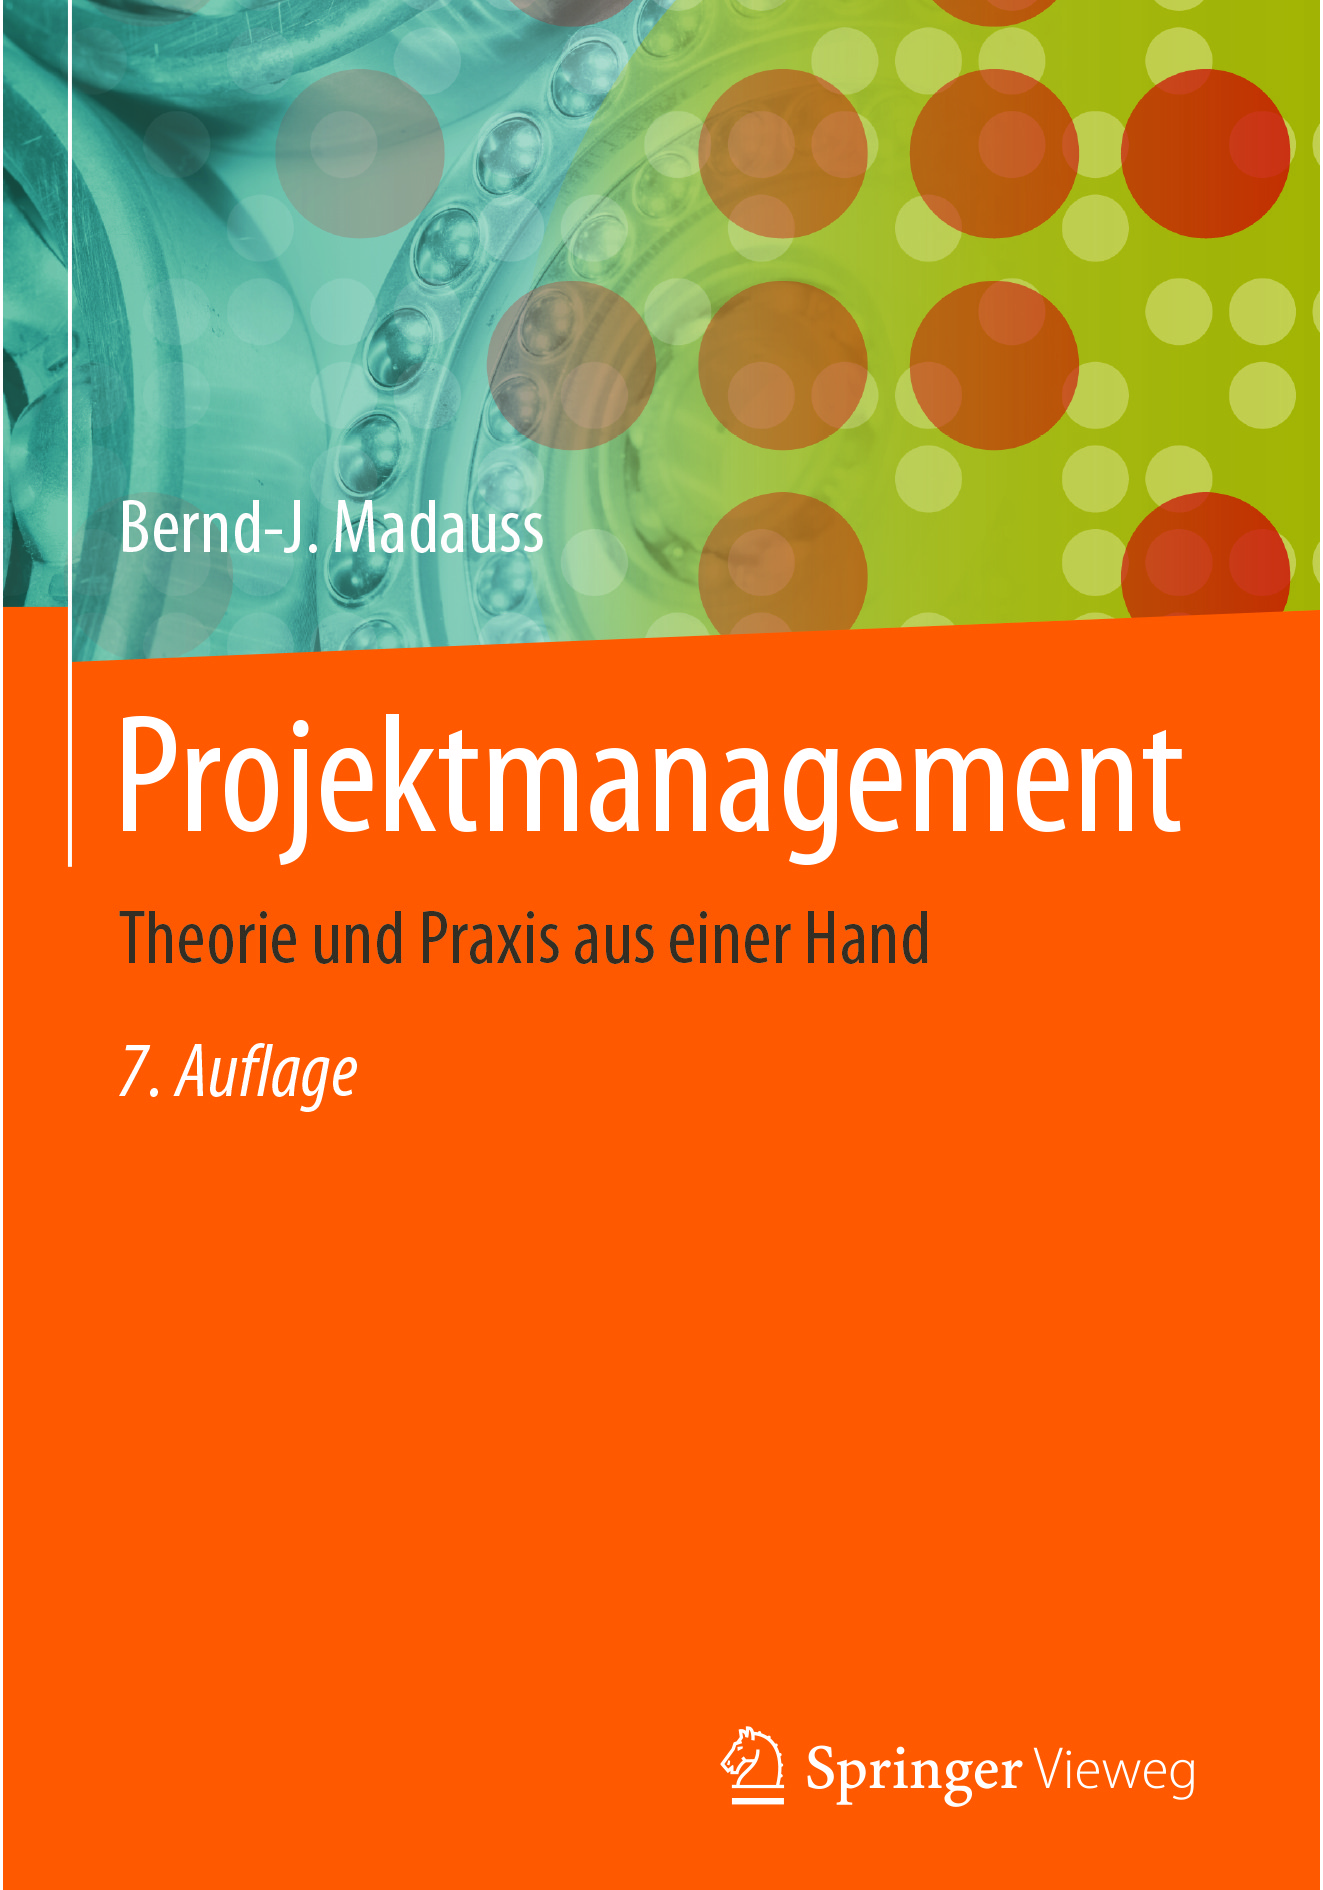 Madauss, Bernd-J - Projektmanagement, ebook